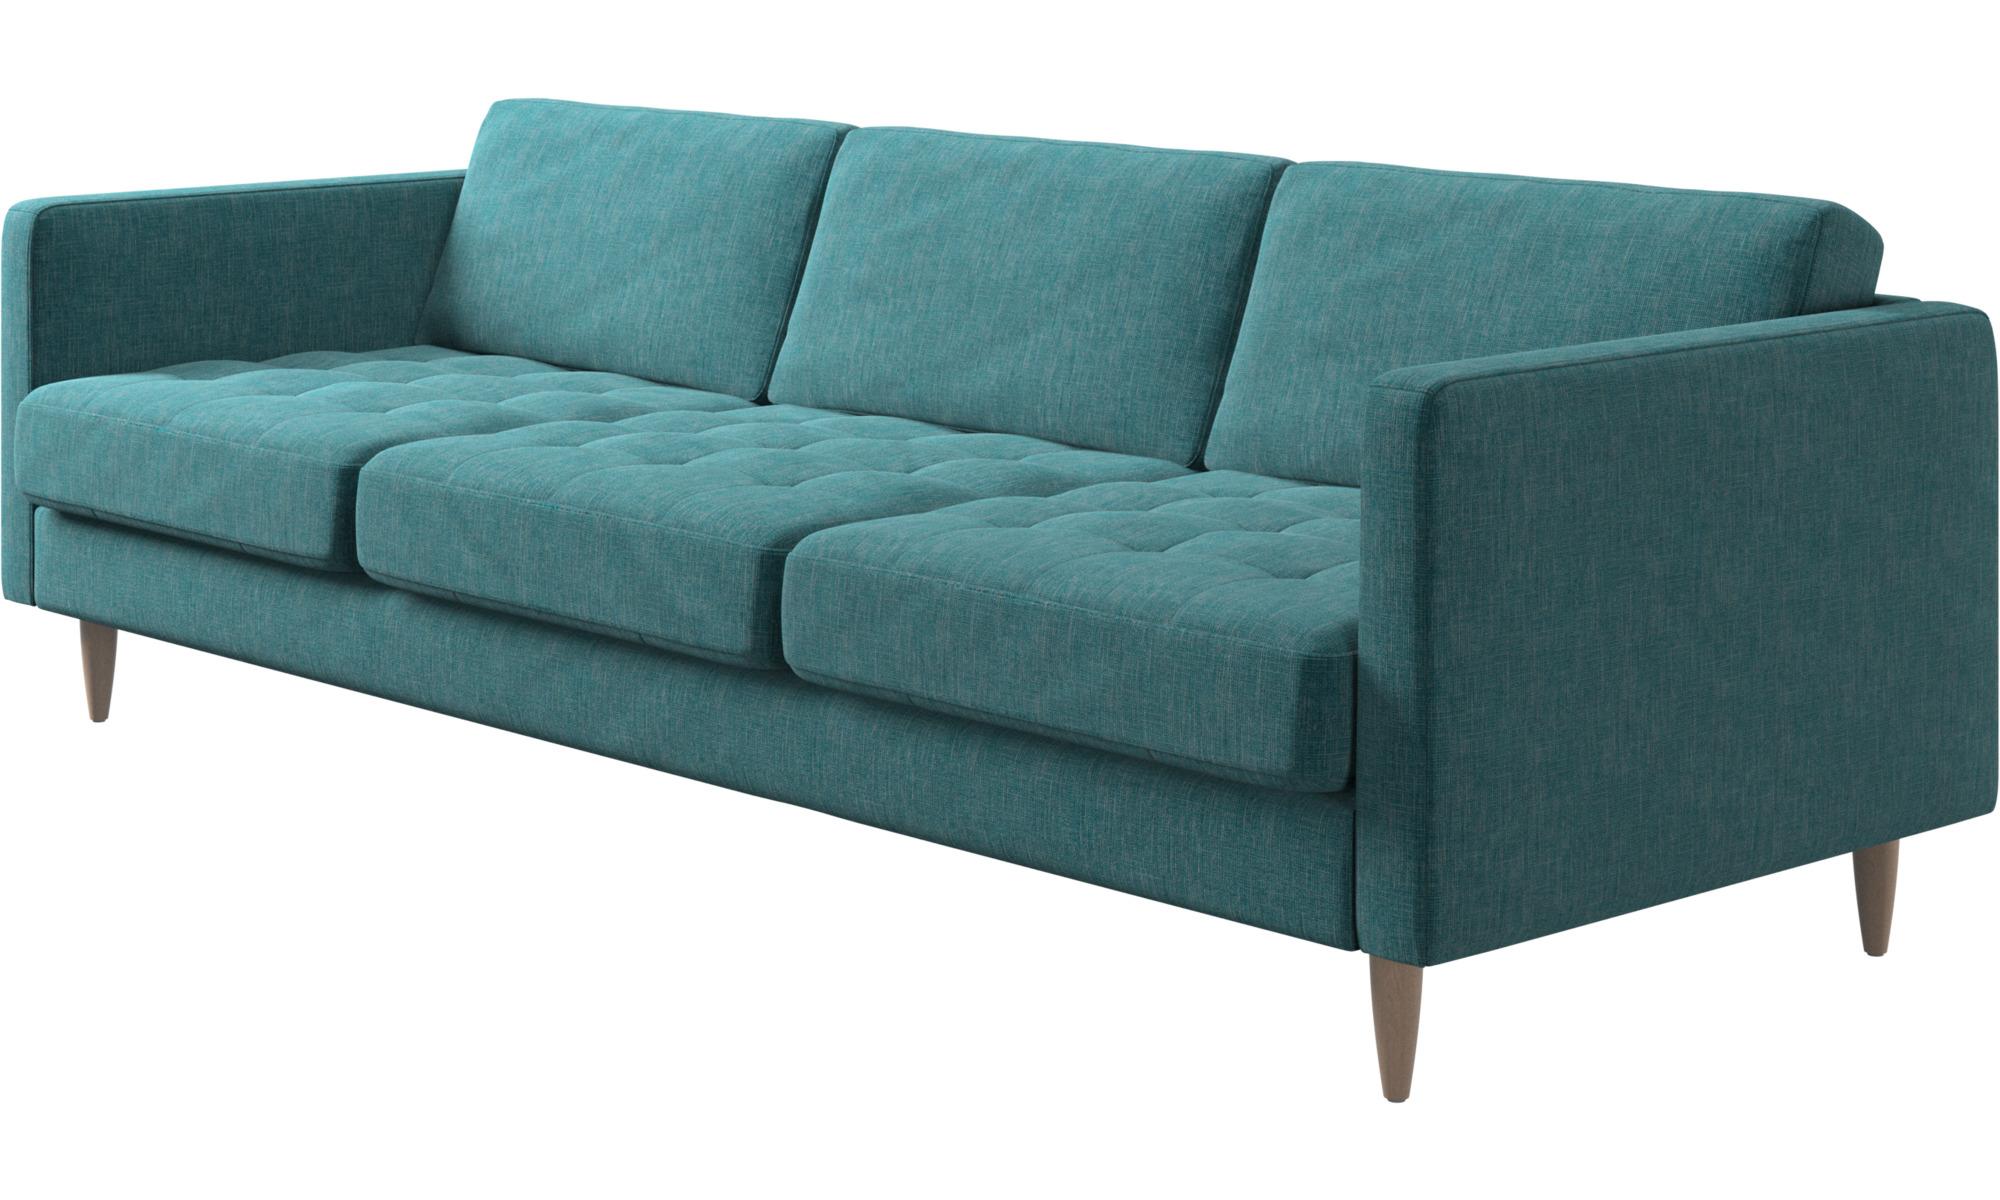 3 seater sofas osaka sofa tufted seat boconcept. Black Bedroom Furniture Sets. Home Design Ideas